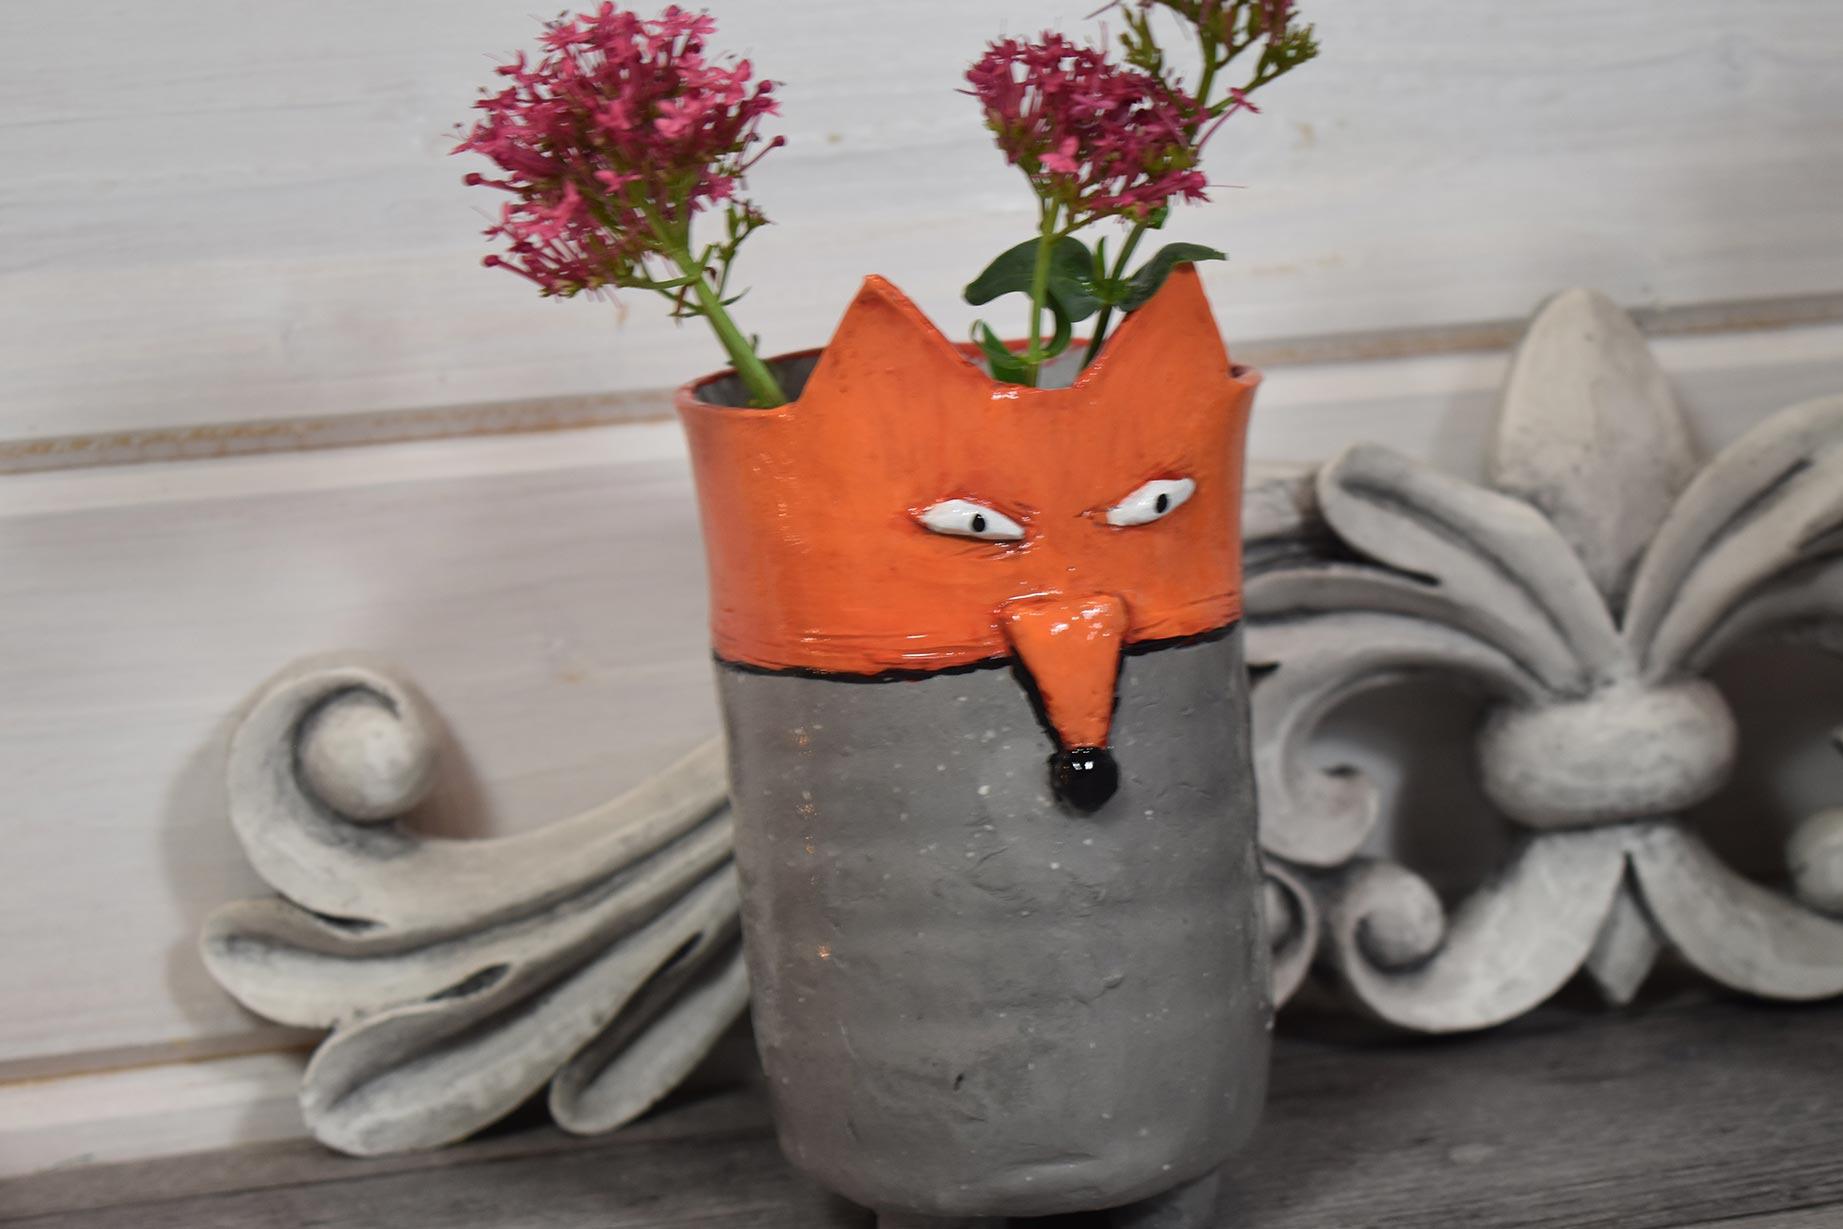 recyclage-plastique-modeler-sechage-air-vase-renard